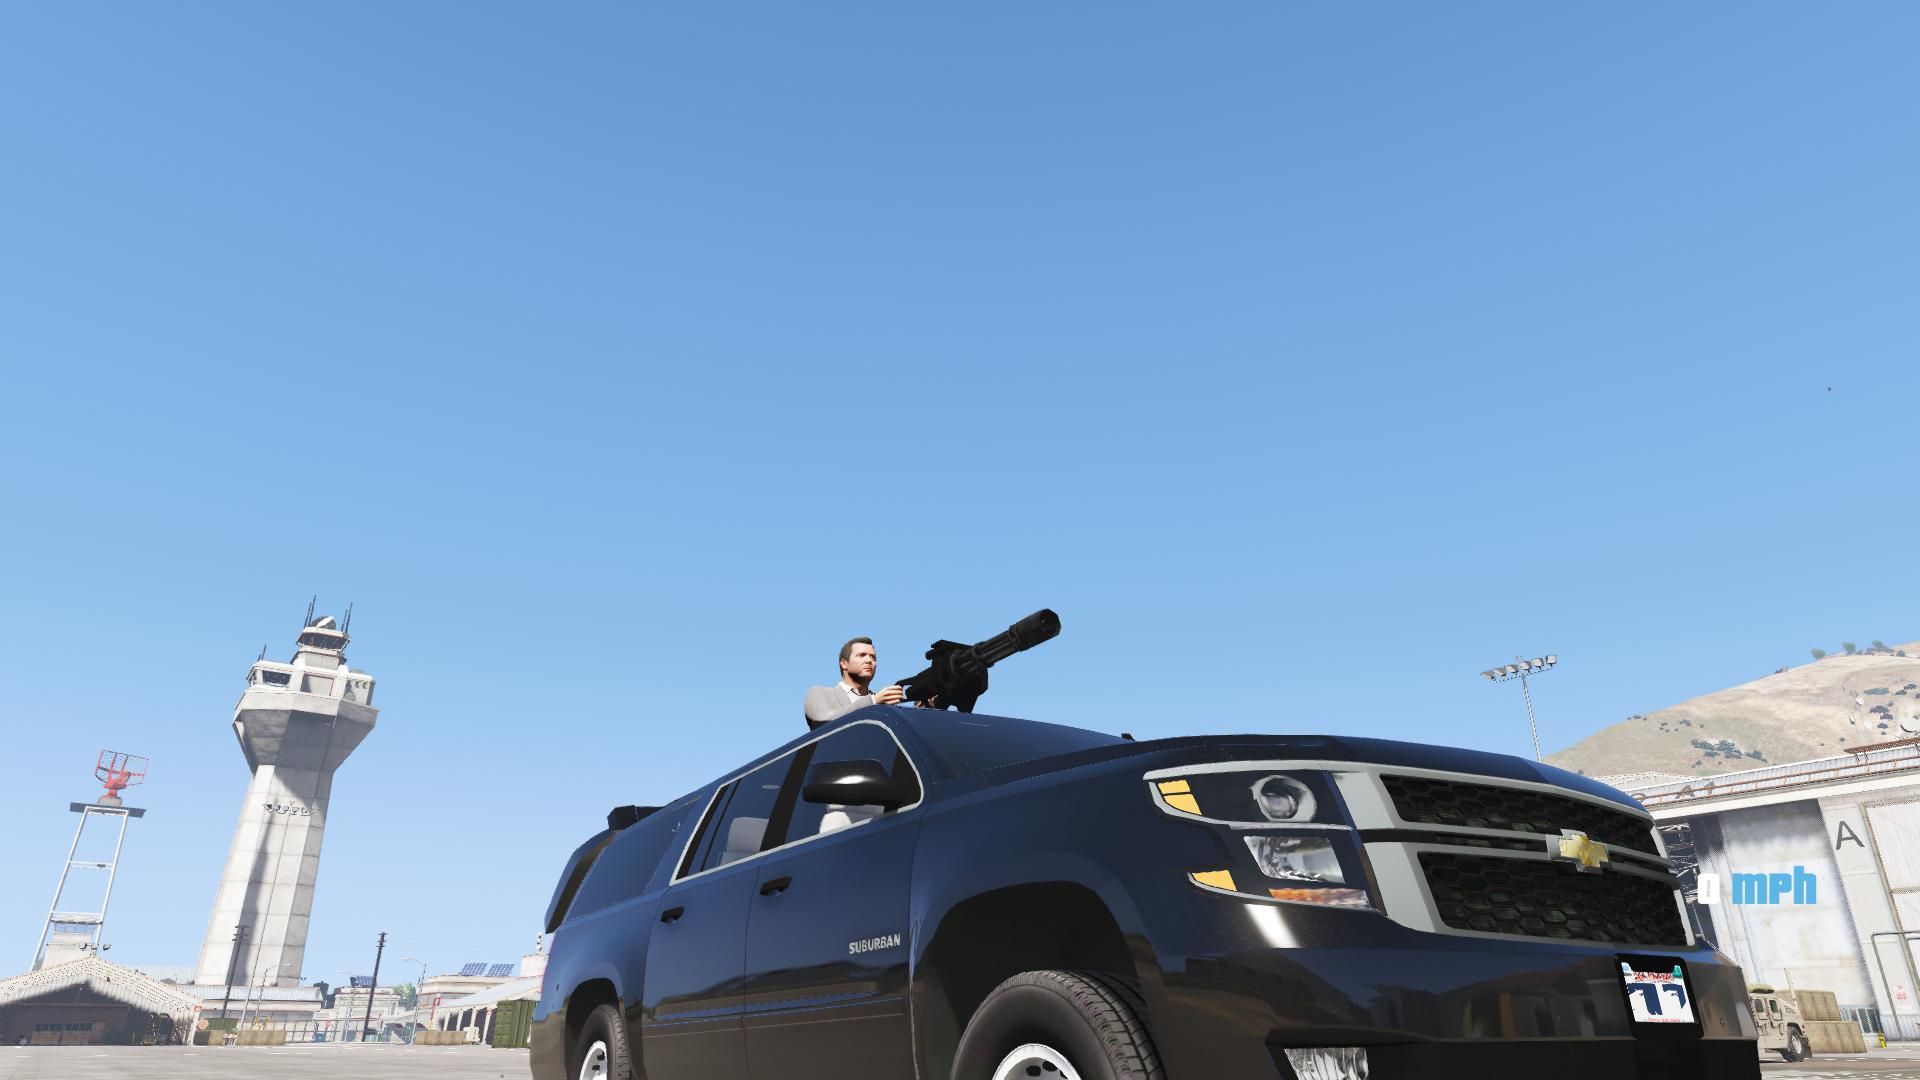 2015 Secret Service Chevy Suburban With Gun Turret[ARMORED